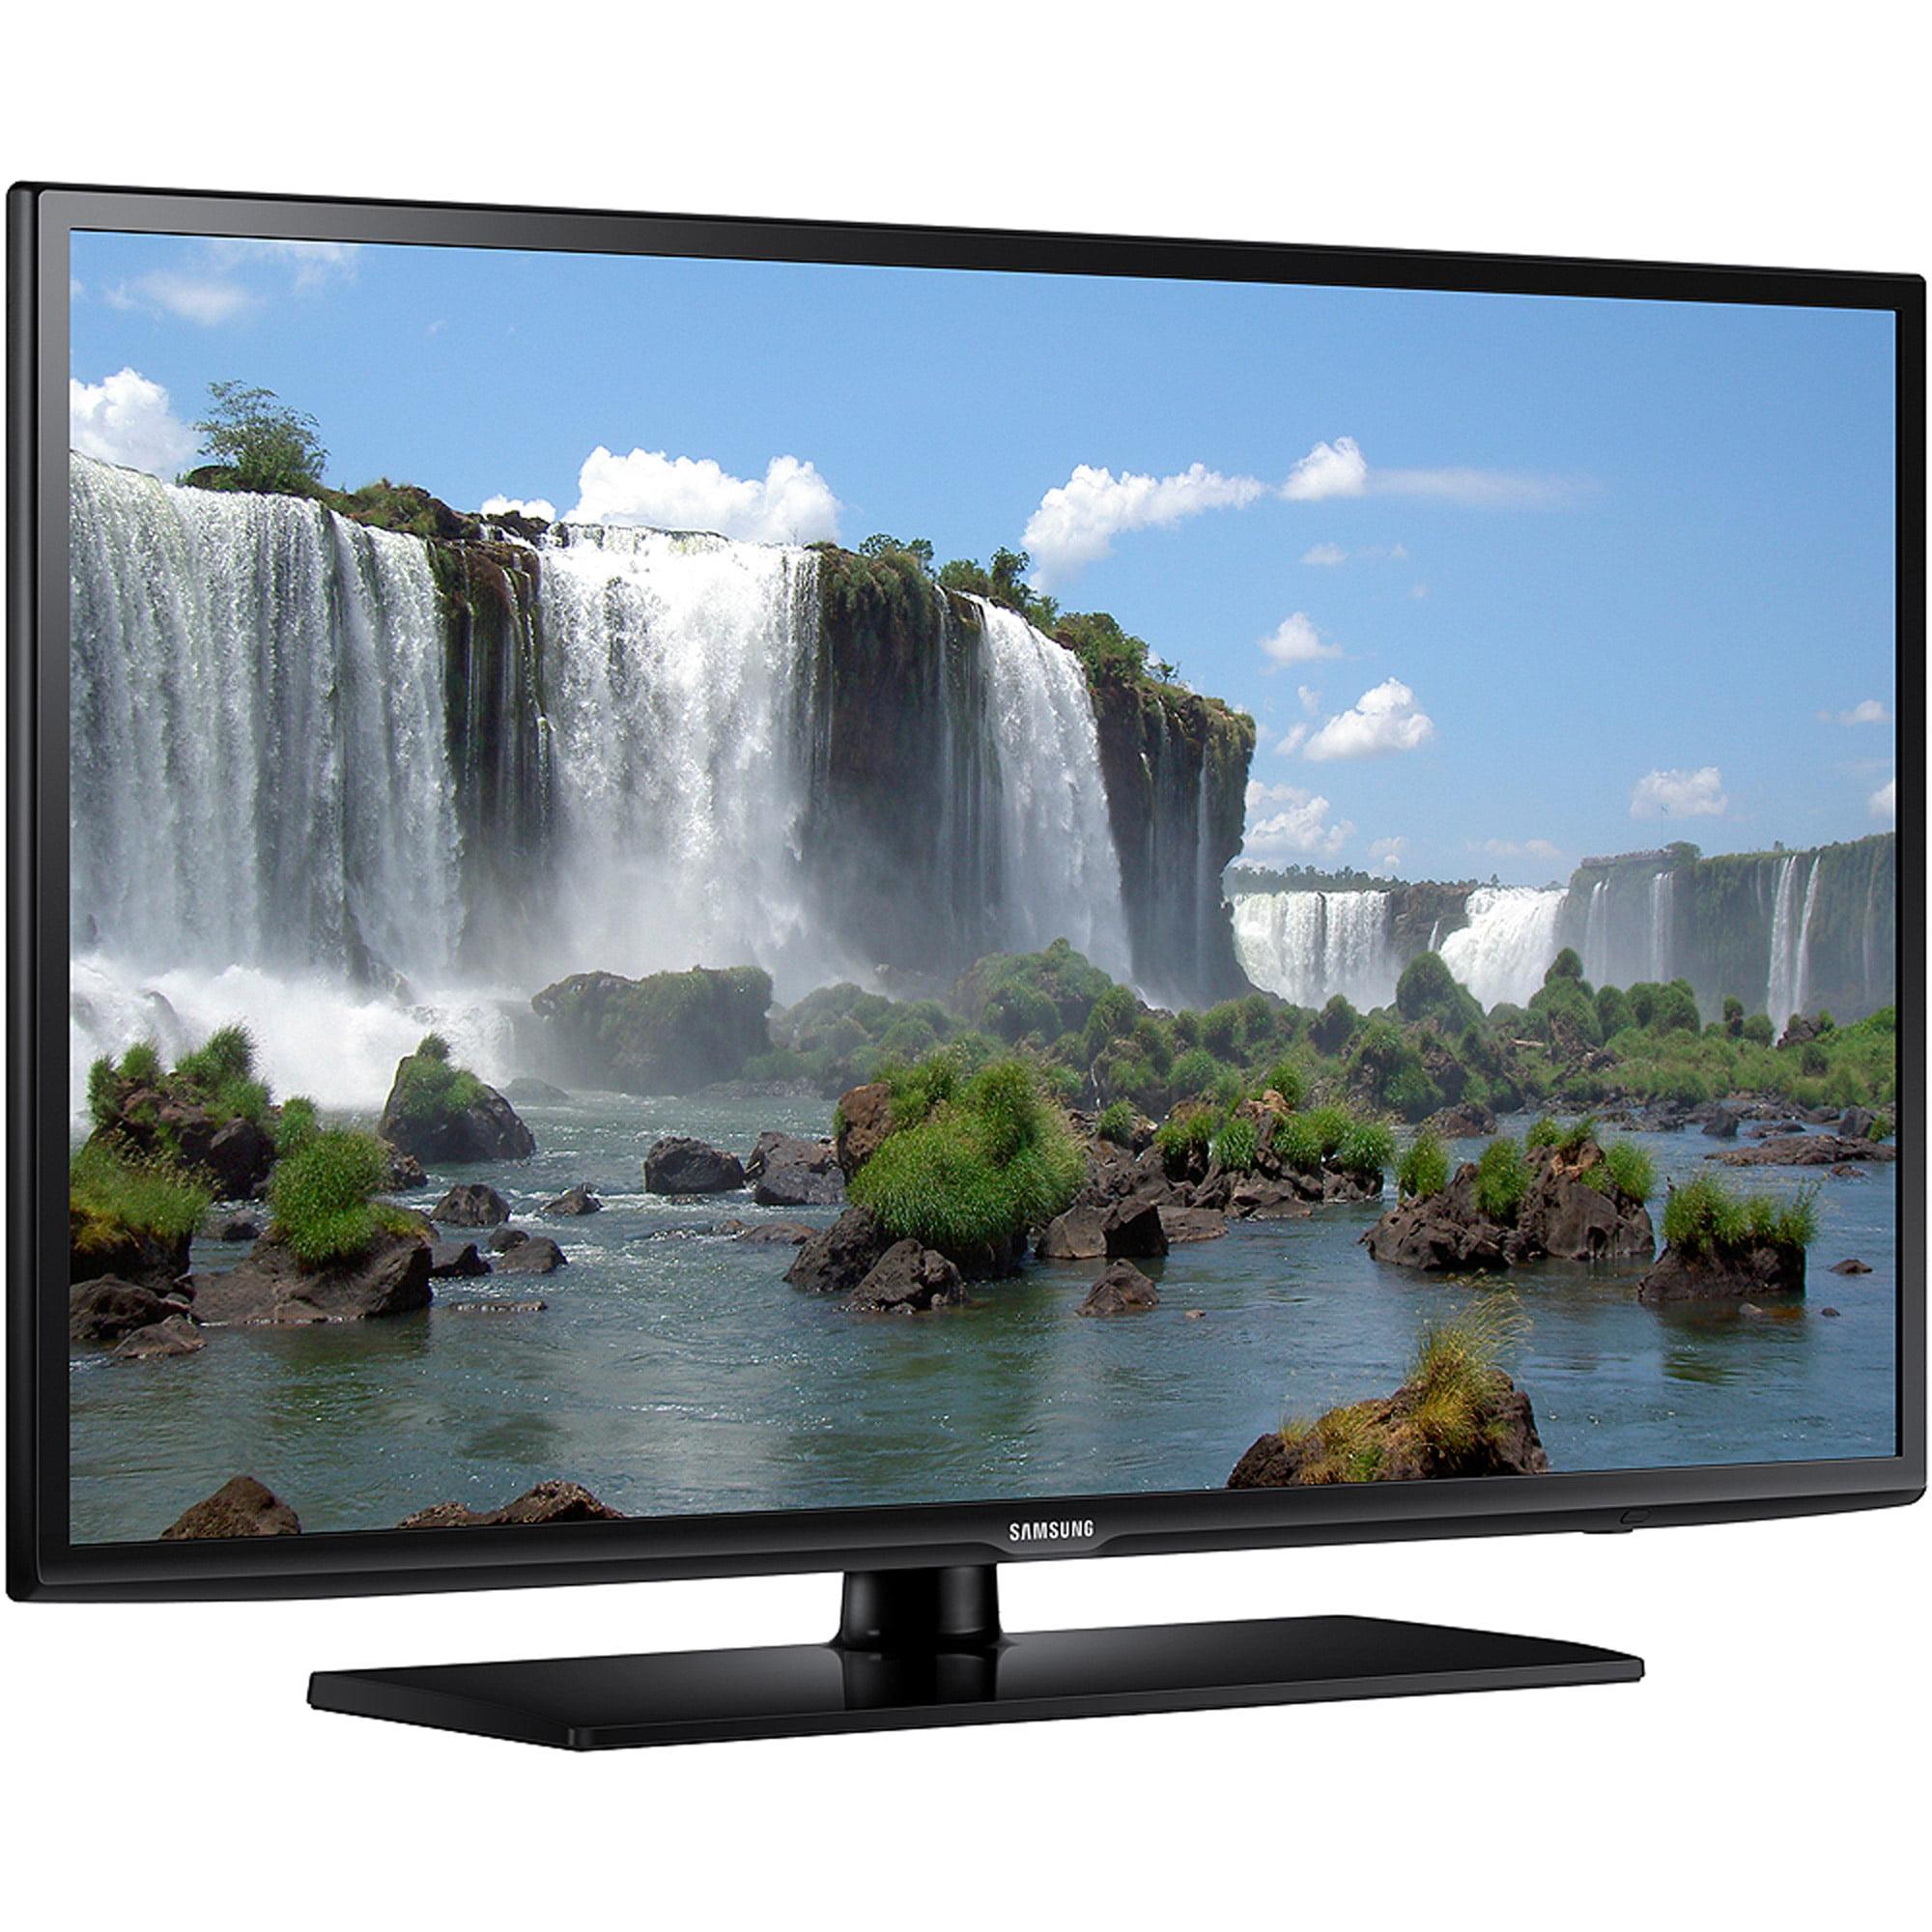 samsung 50 class fhd 1080p smart led tv un50j6200 walmart com rh walmart com Samsung Smart TV Power Button Samsung Smart TV Remote Replacement